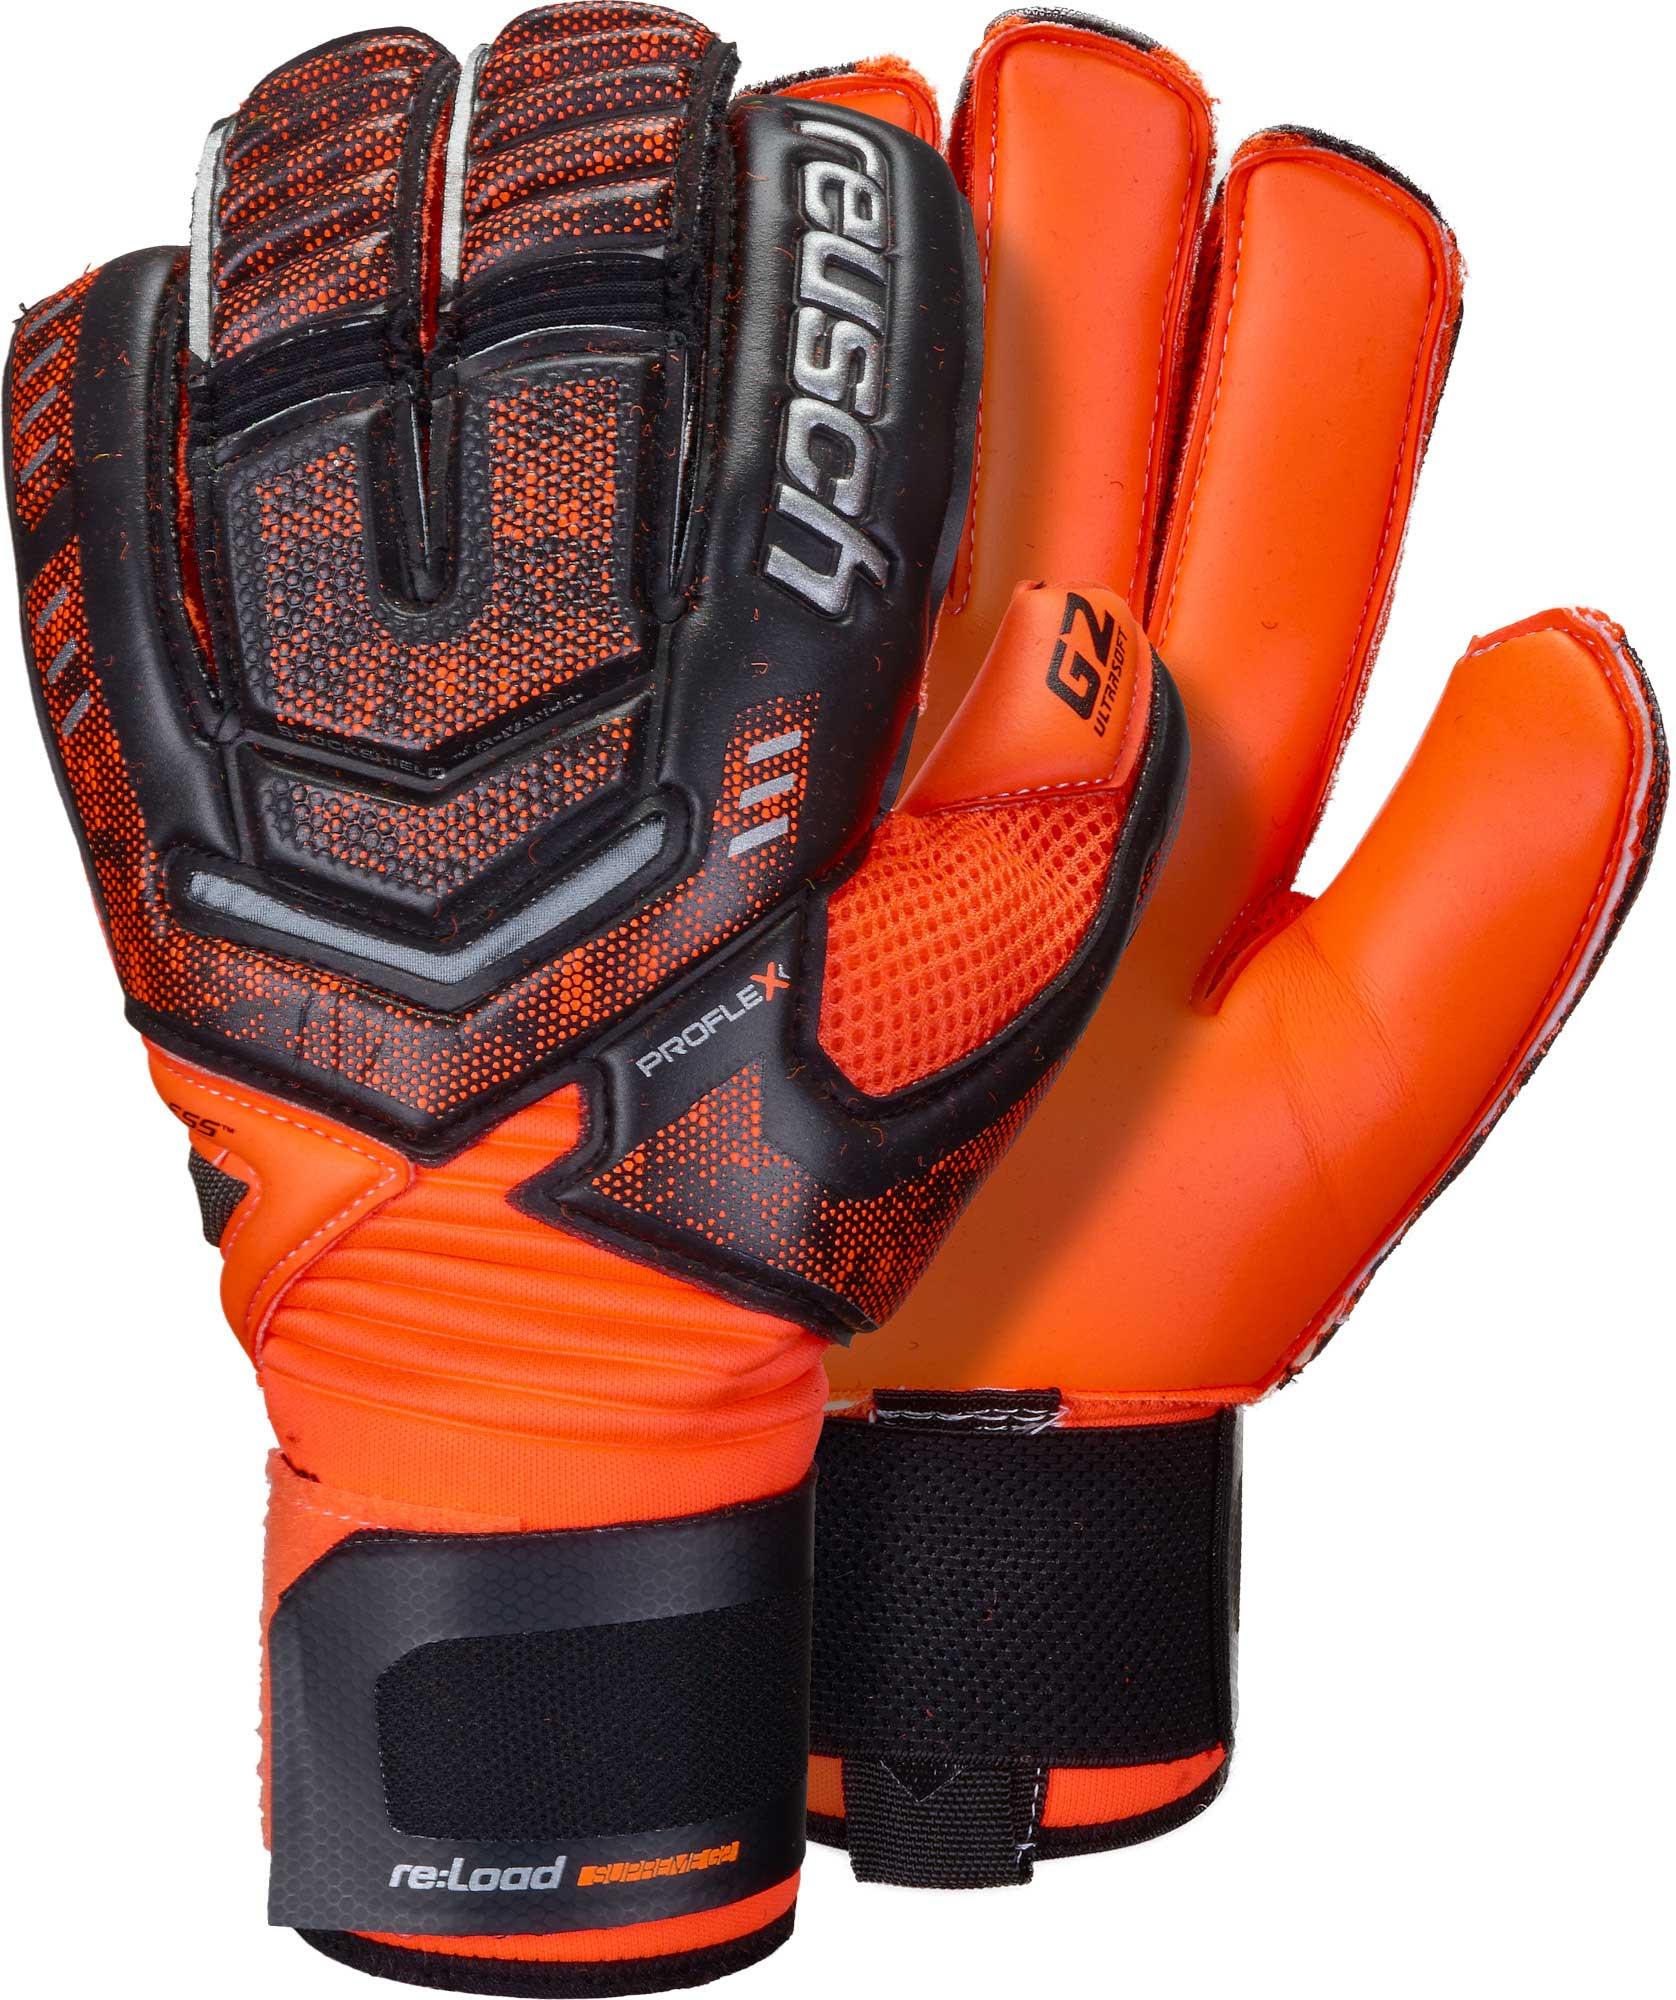 38d9b5aec Reusch RE:LOAD Supreme G2 Goalkeeper Gloves - Black/Shocking Orange ...